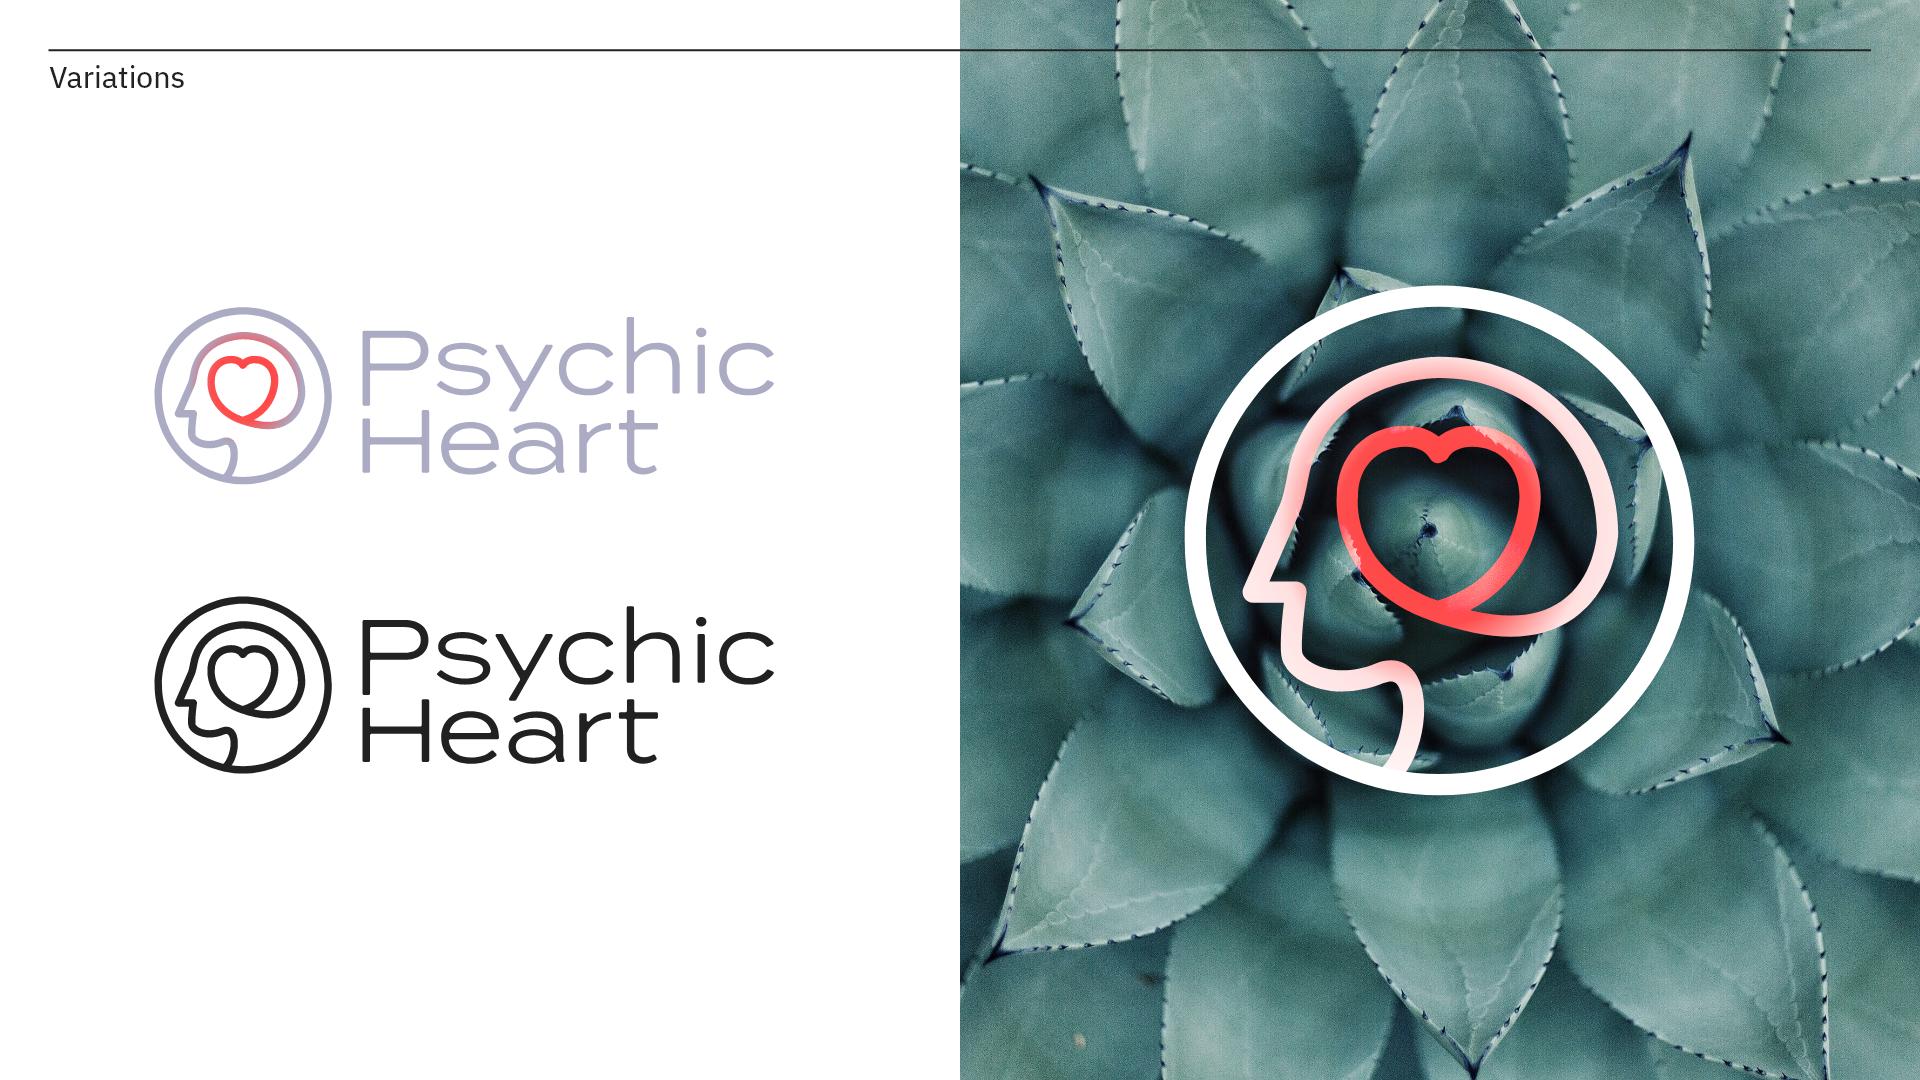 Psychic Heart | Branding Manchester 1 & Design Manchester 3